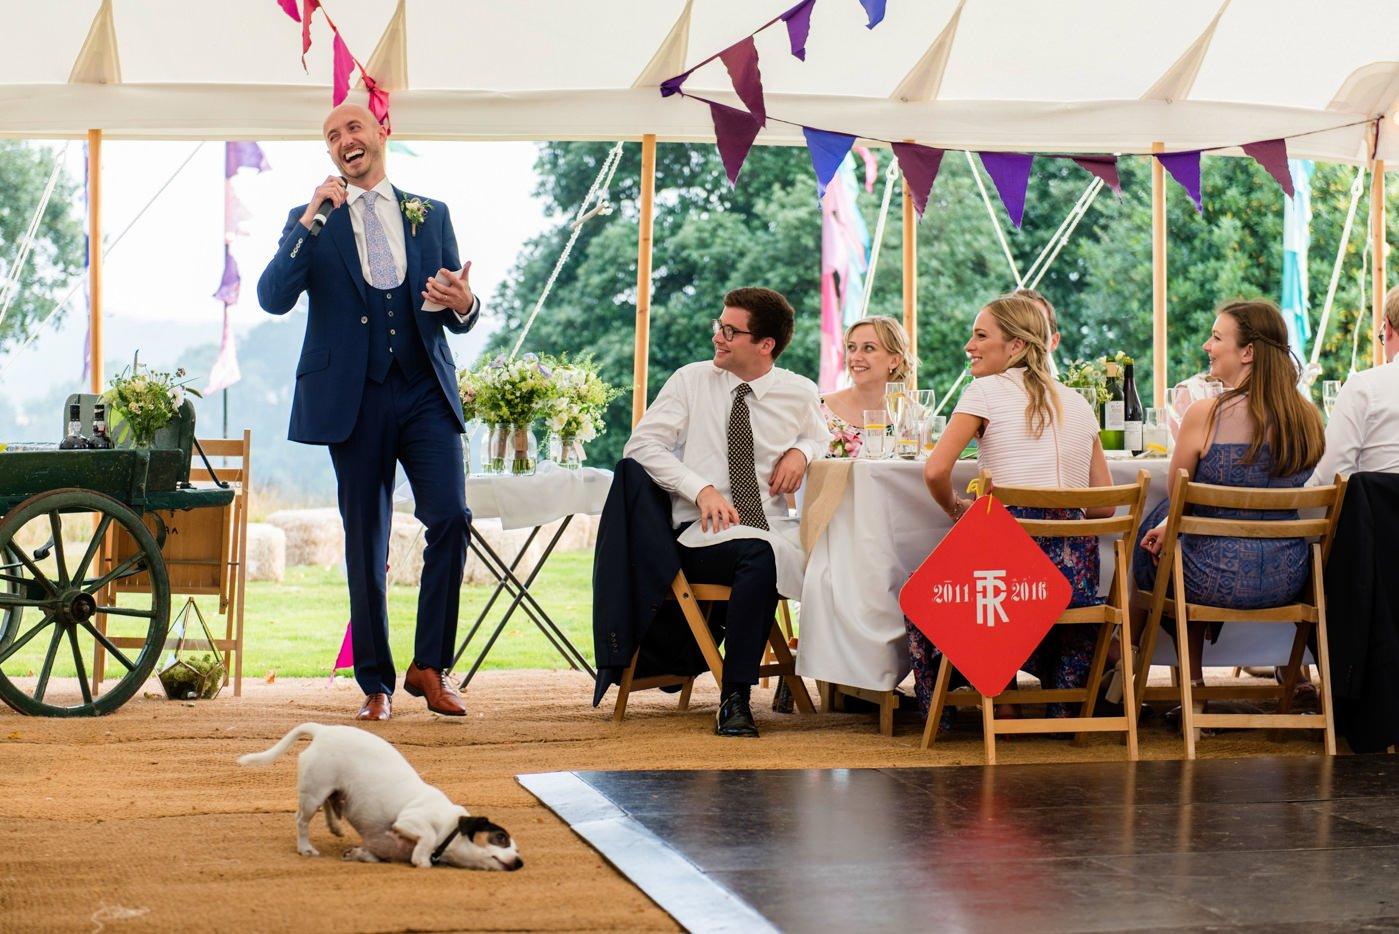 bignor-park-wedding-photography-robyn-and-tom-95